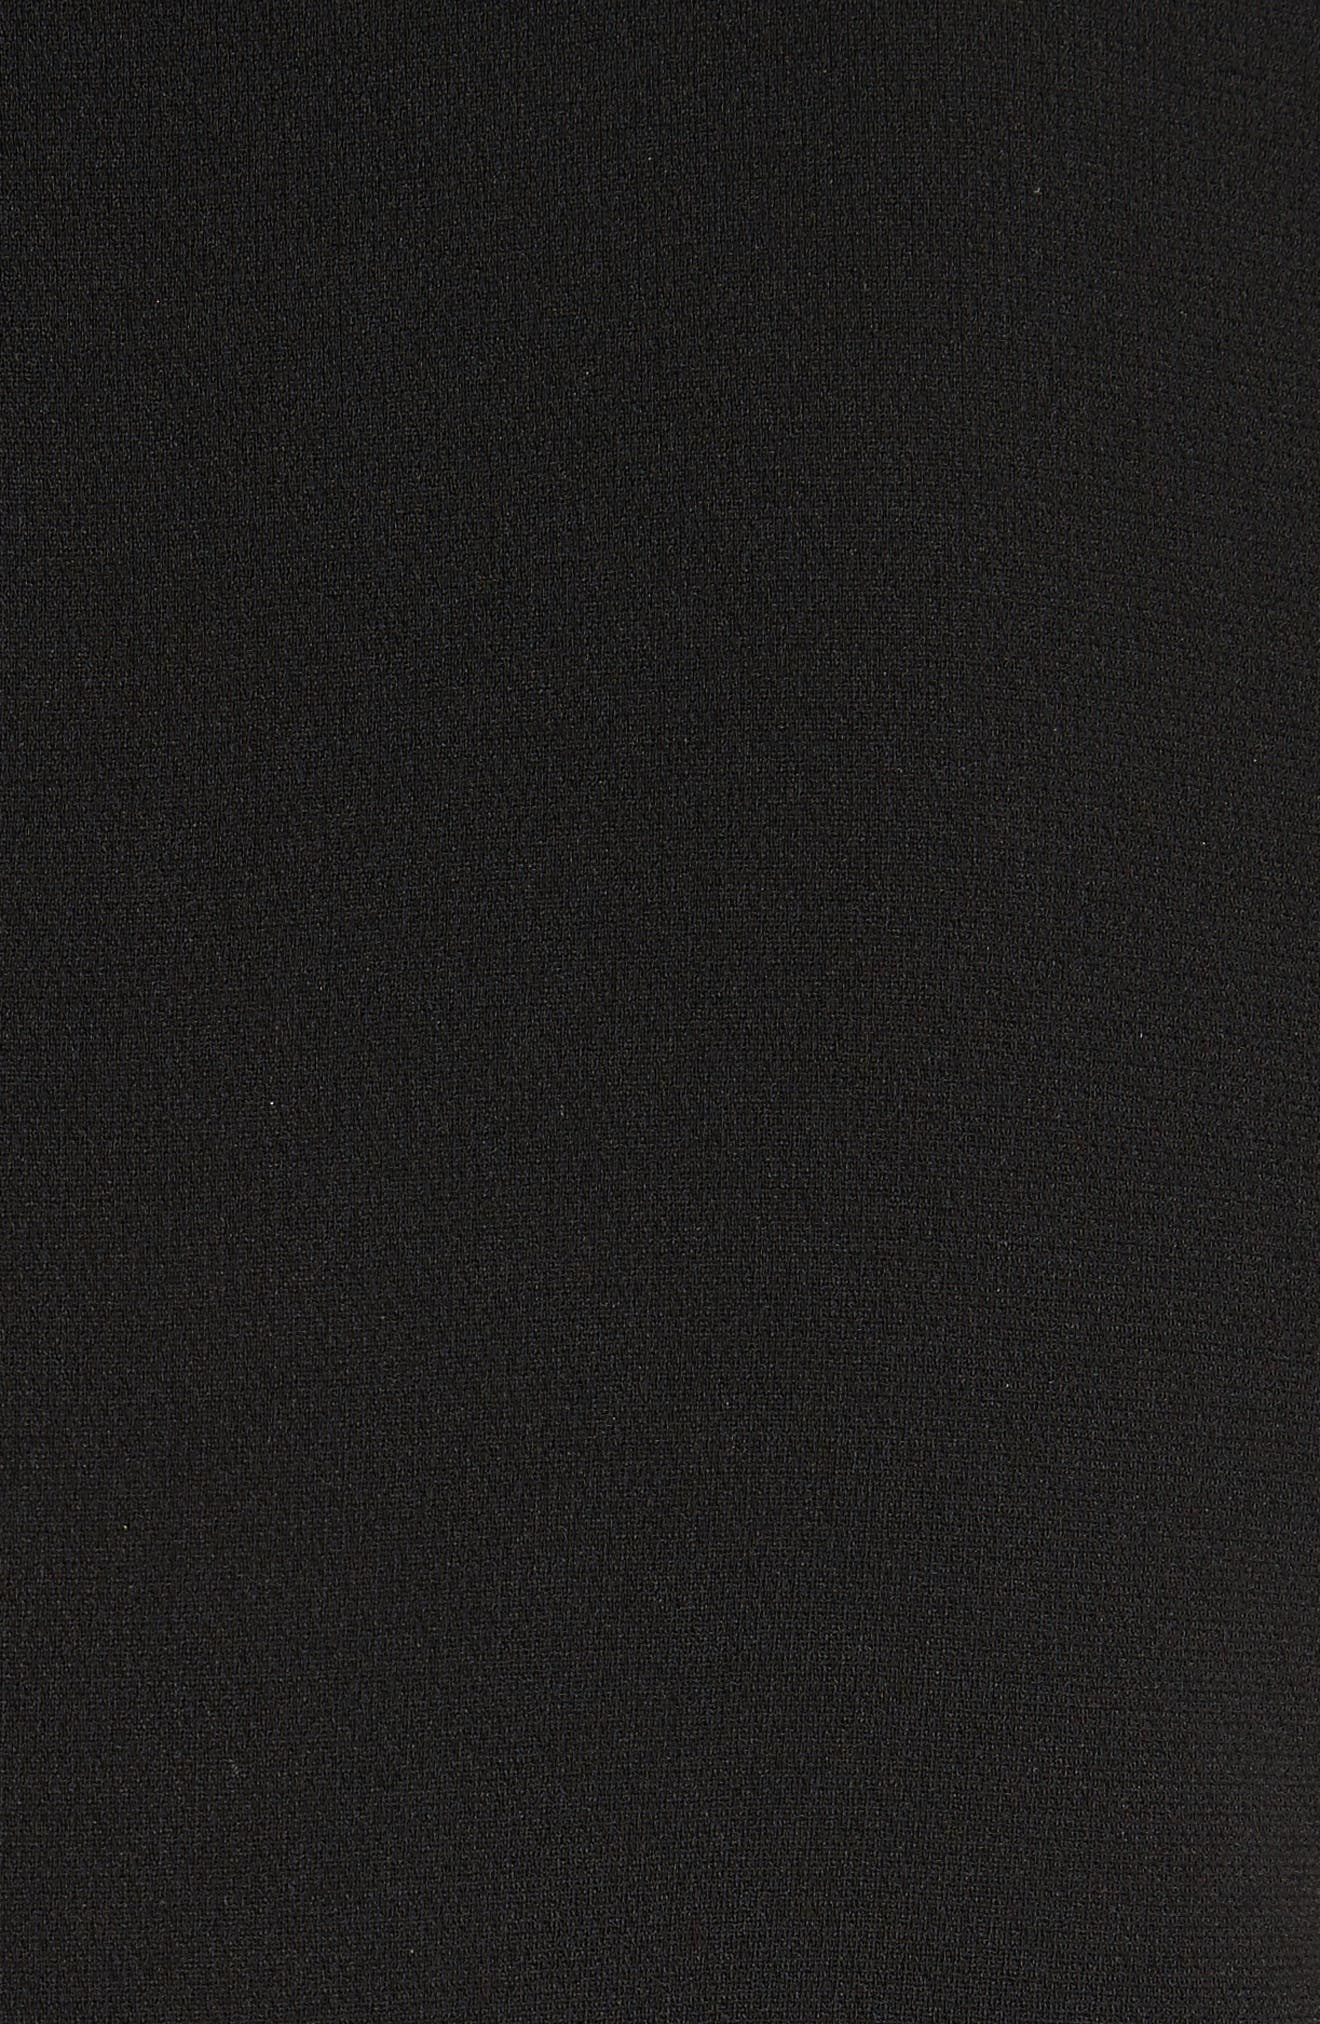 Admiral Crepe Slit Collar Sheath Dress,                             Alternate thumbnail 5, color,                             001